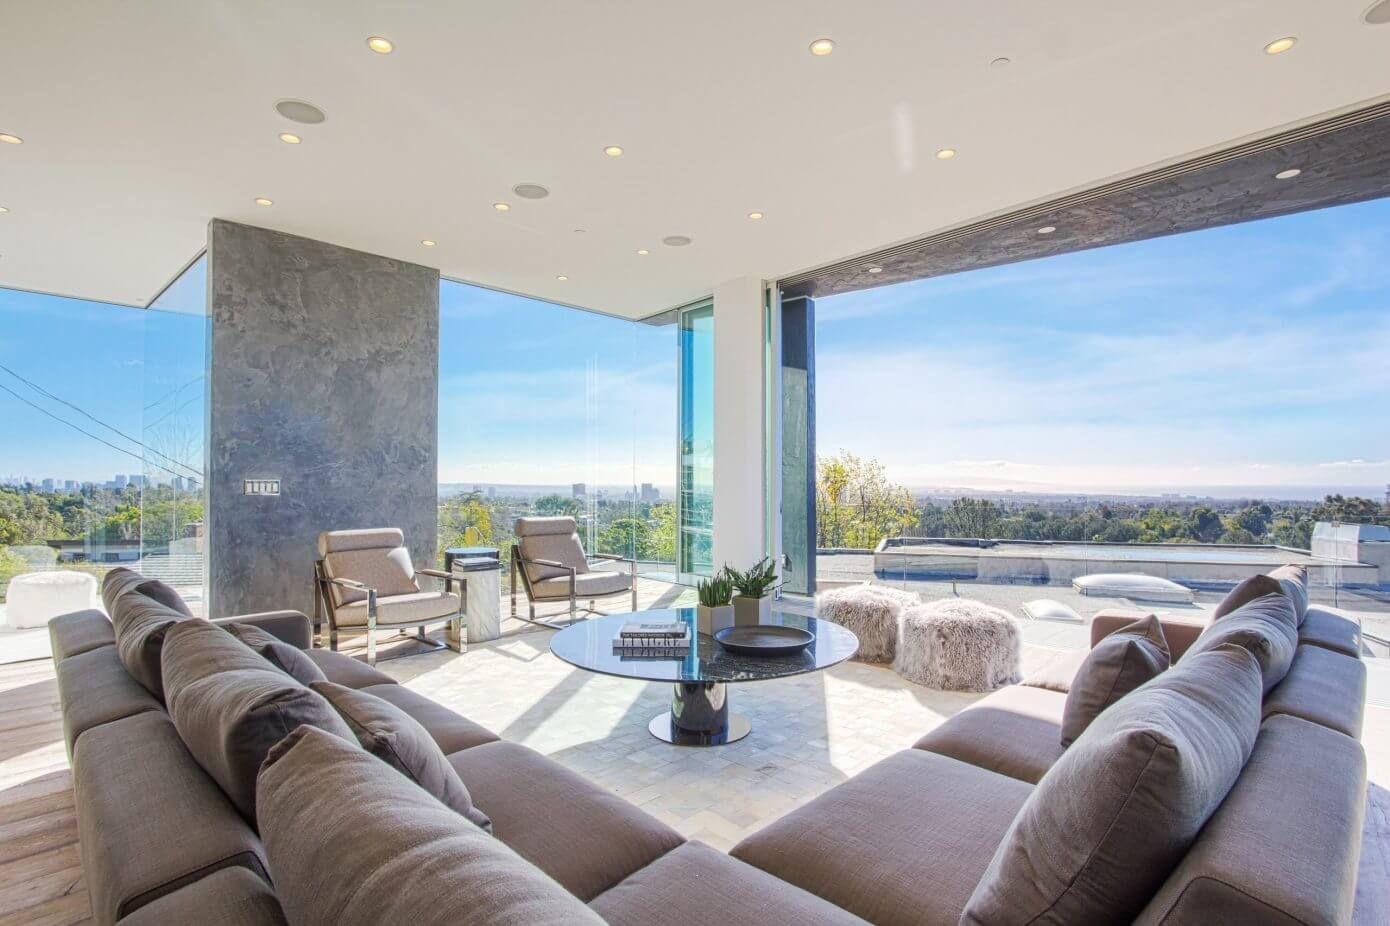 Brentwood Modern By Michelle Ruben Interiors Casa Design